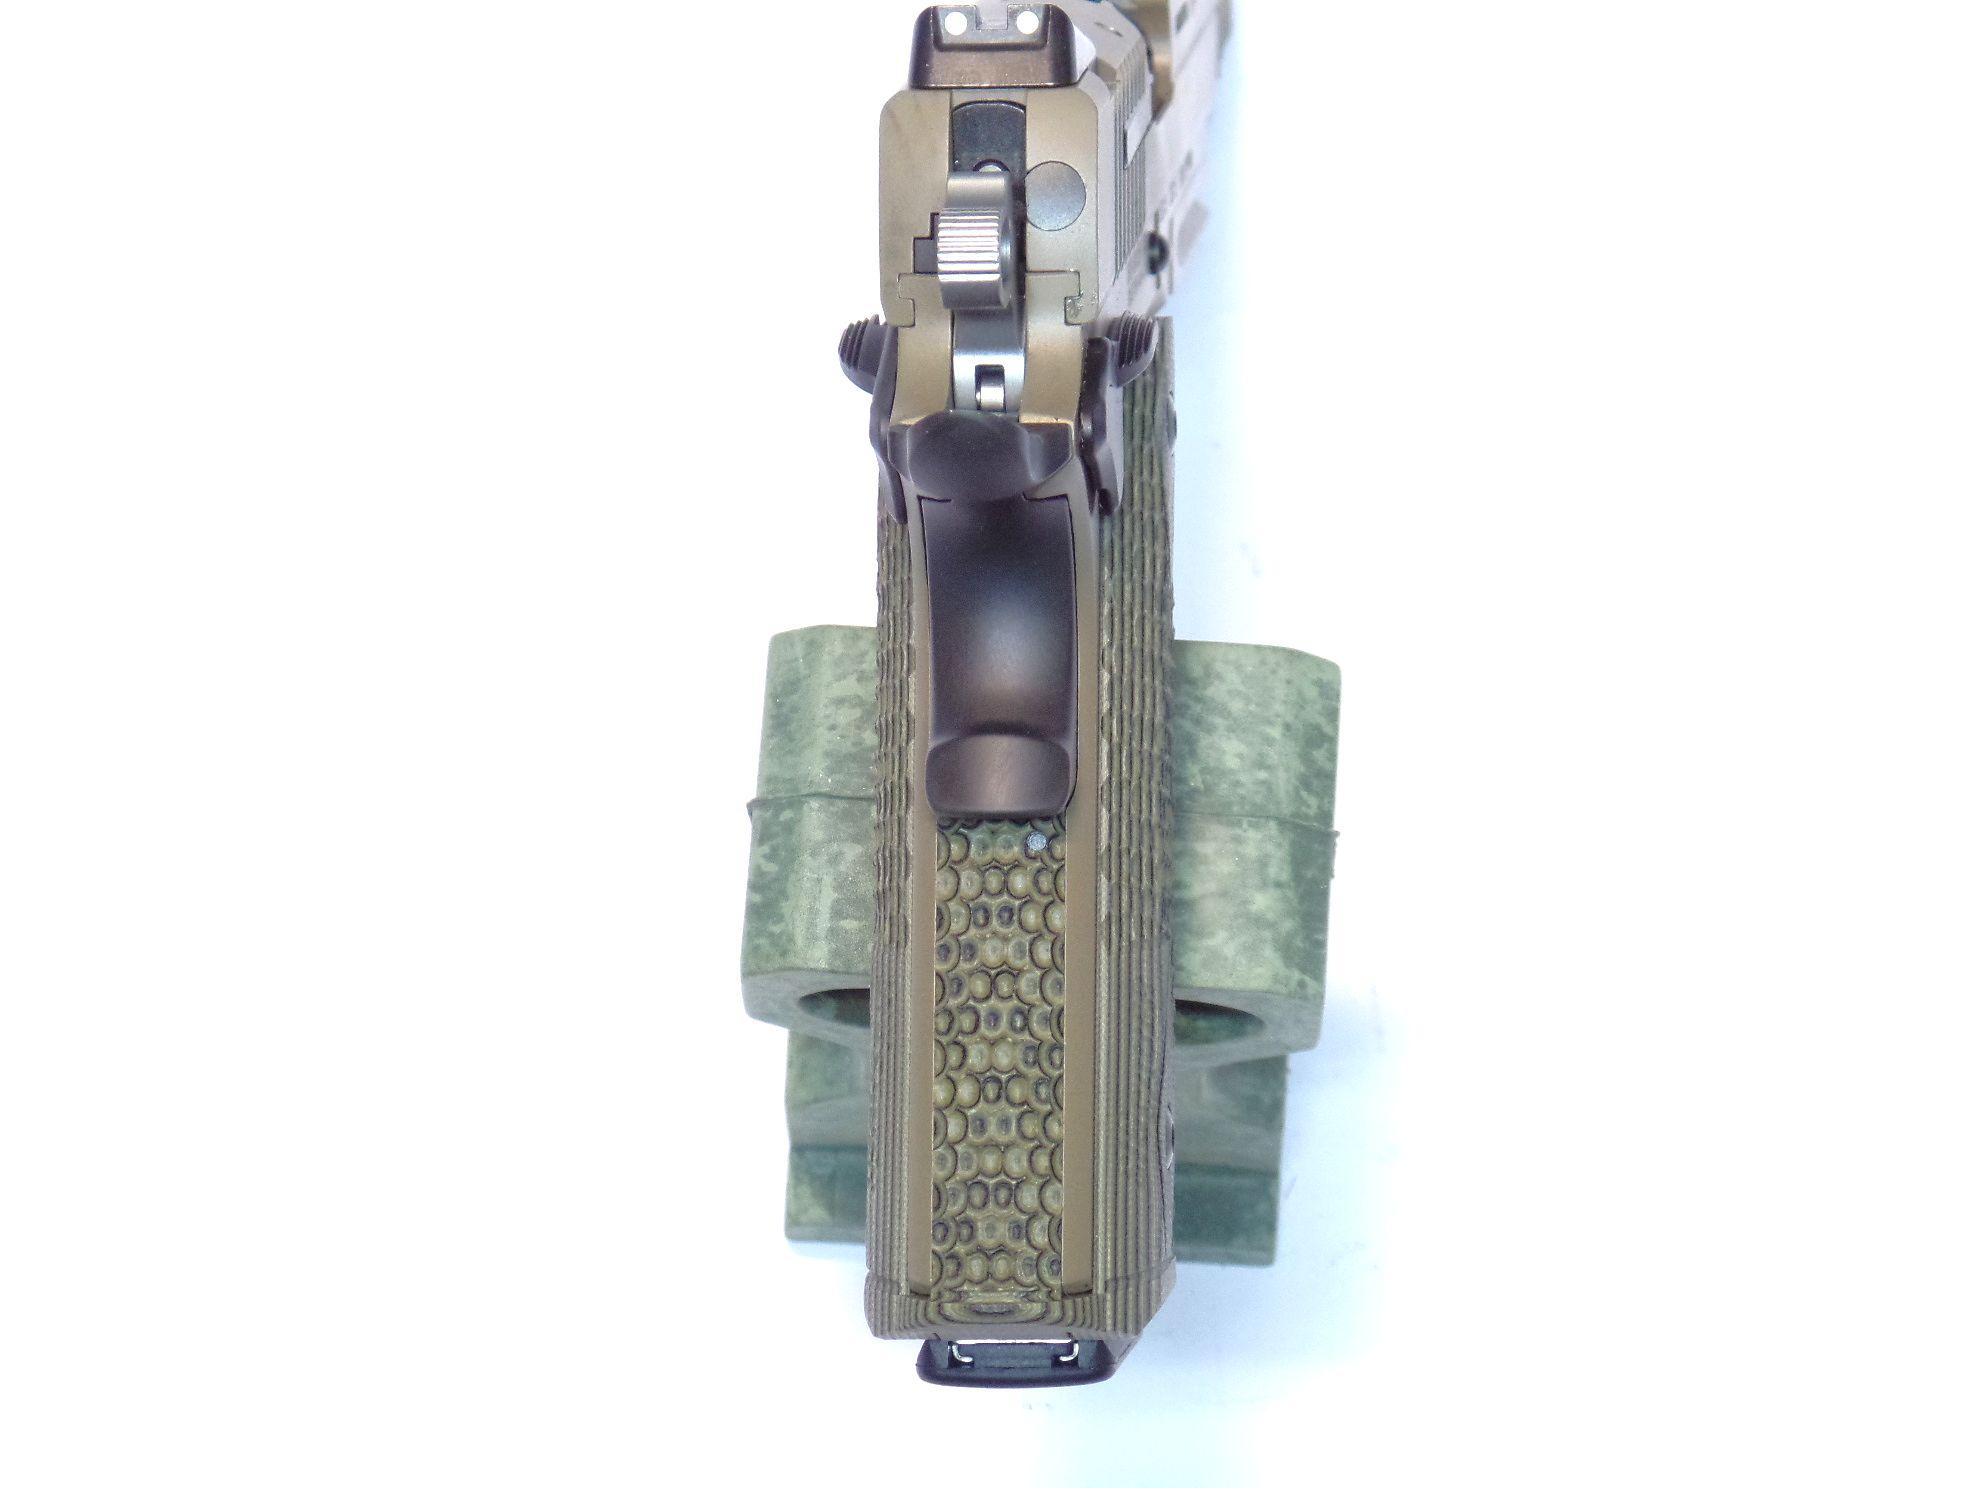 SIG SAUER 1911 Scorpion calibre 45acp